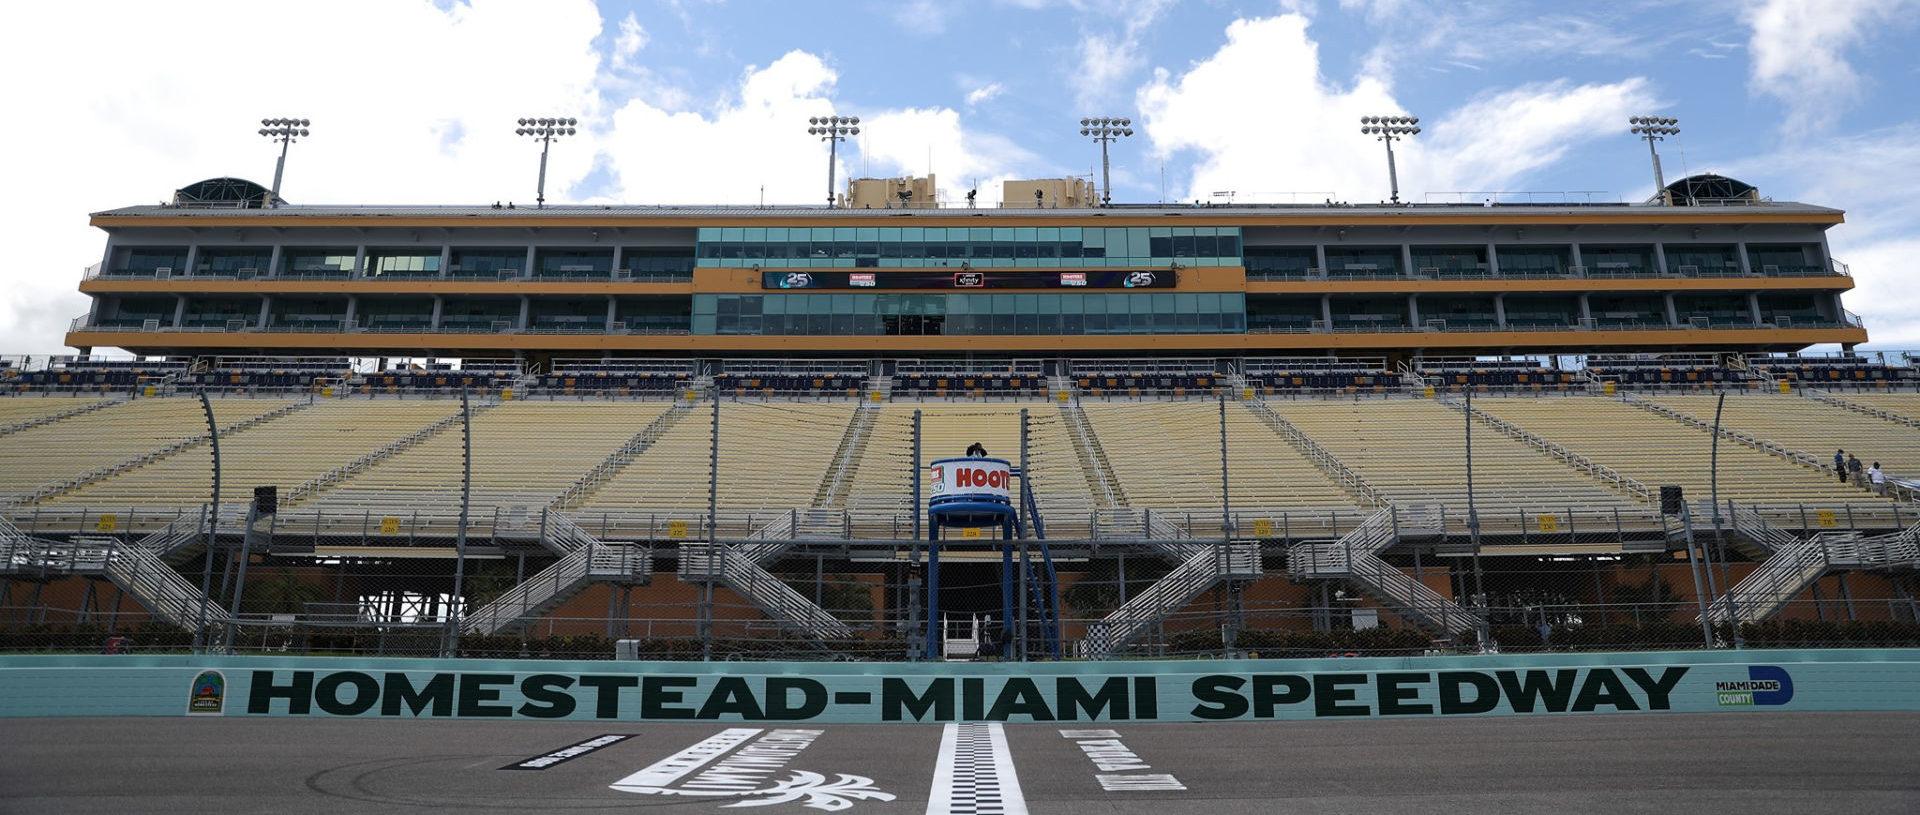 Homestead-Miami Speedway. Photo courtesy Homestead-Miami Speedway.